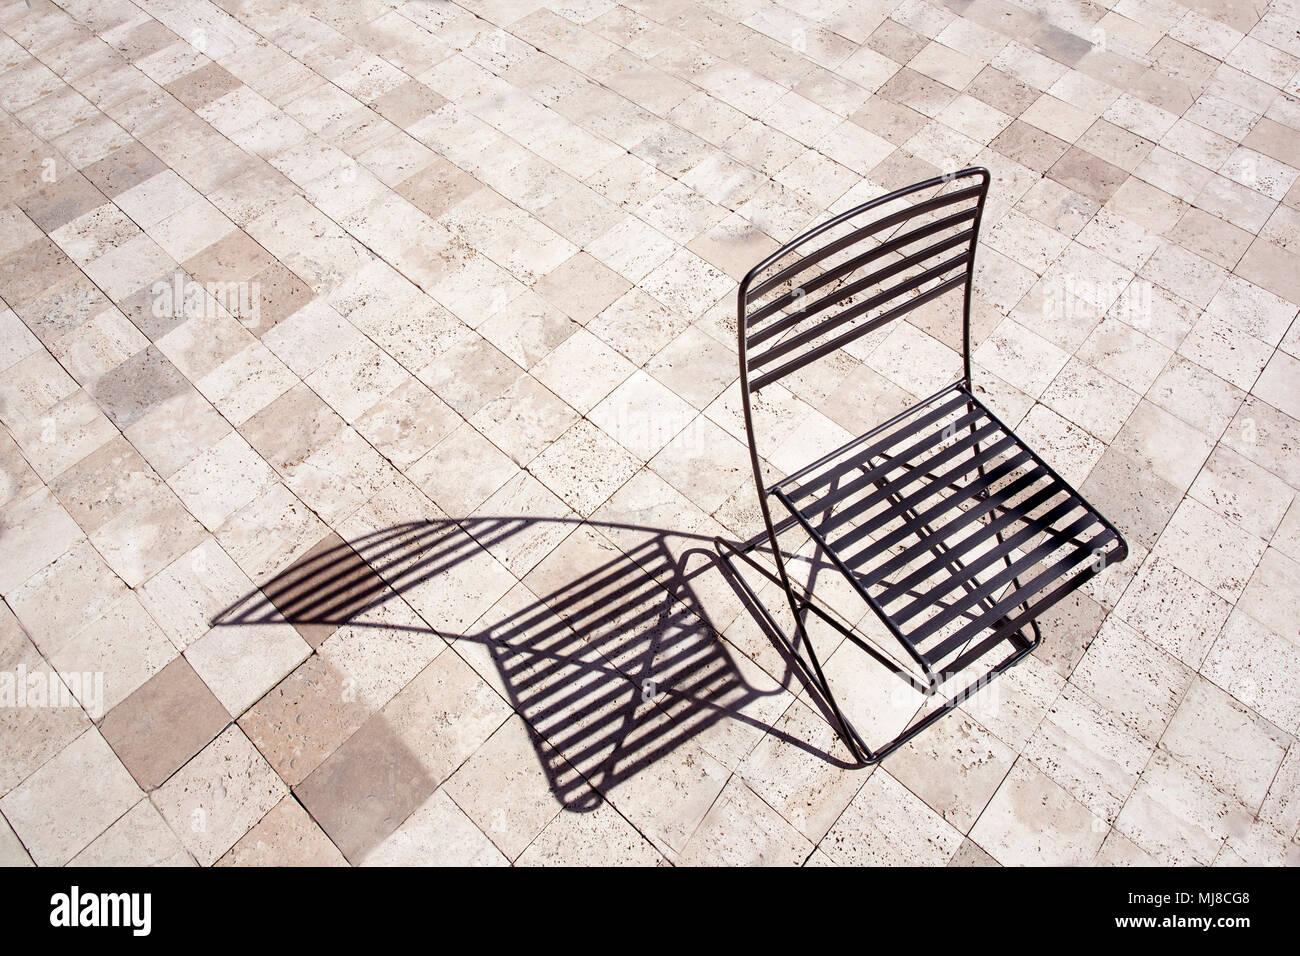 High Angle View Of Black Metal Folding Chair Casting Shadow Onto Brown  Paving.